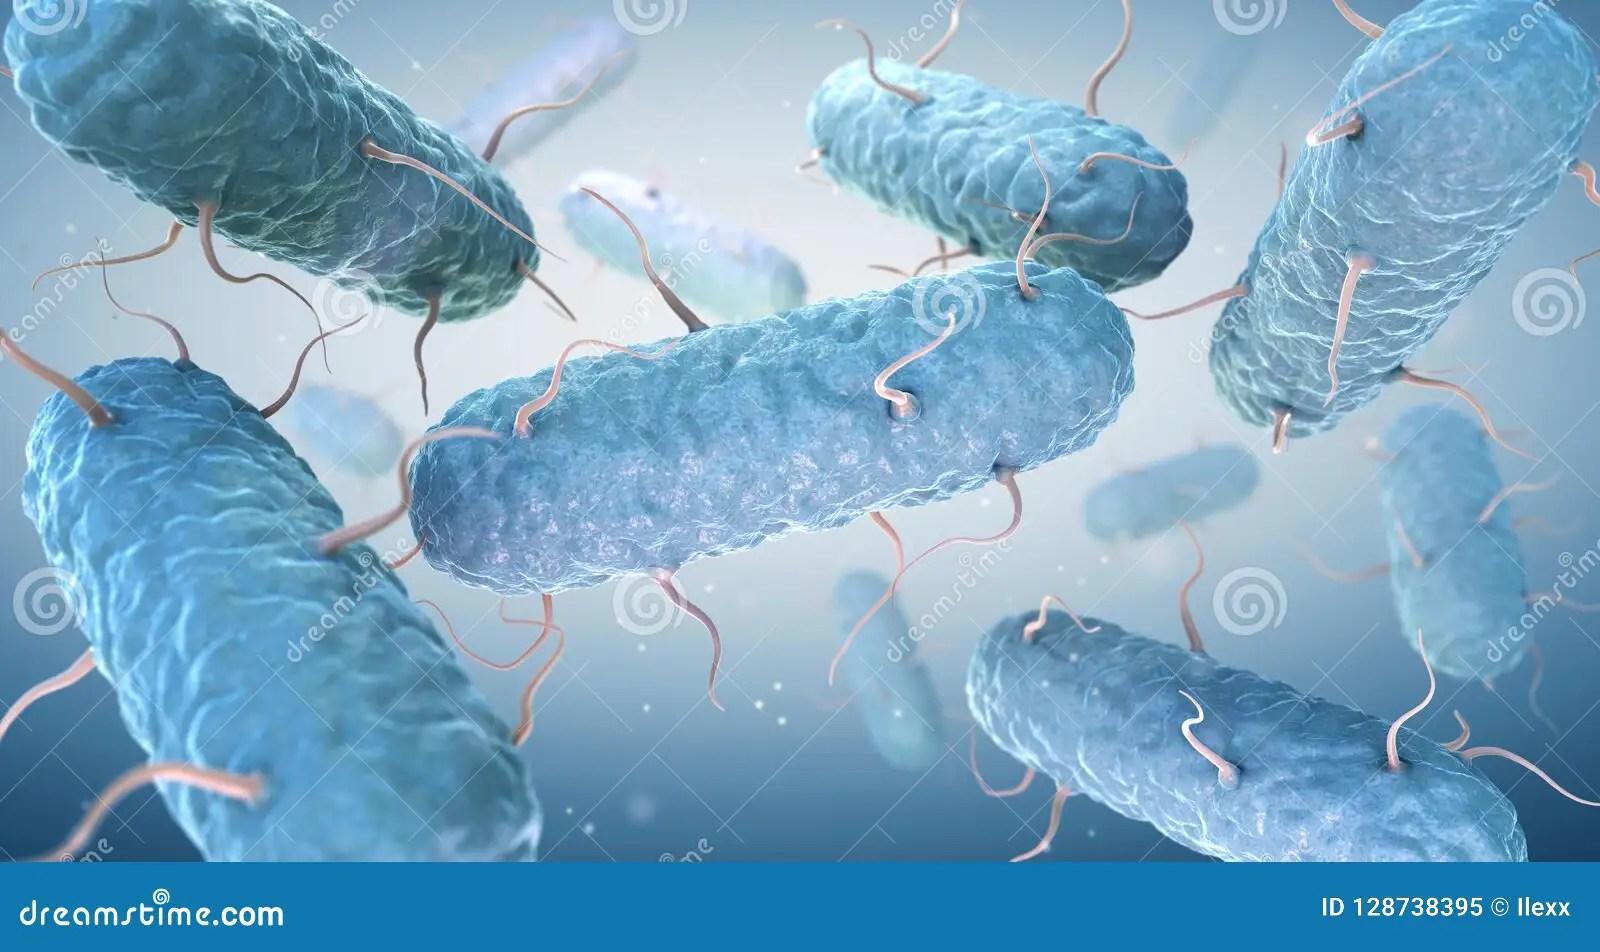 Enterobacteria Enterobacteriaceae Are A Large Family Of